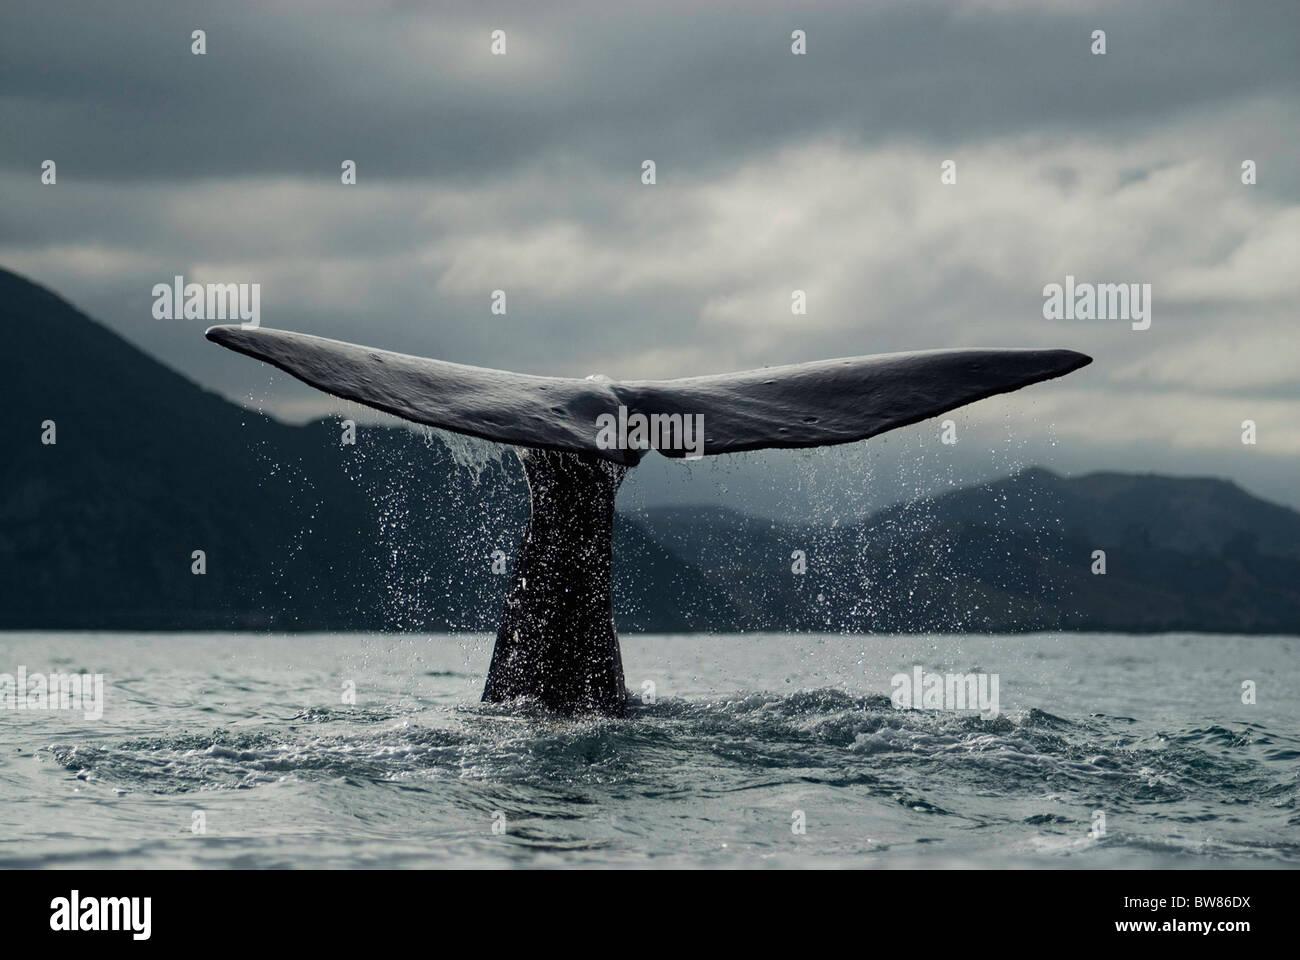 Balena Blu {Balaenoptera musculus} immersioni subacquee, coda fluke, Kaikoura, Isola del Sud, Nuova Zelanda Immagini Stock